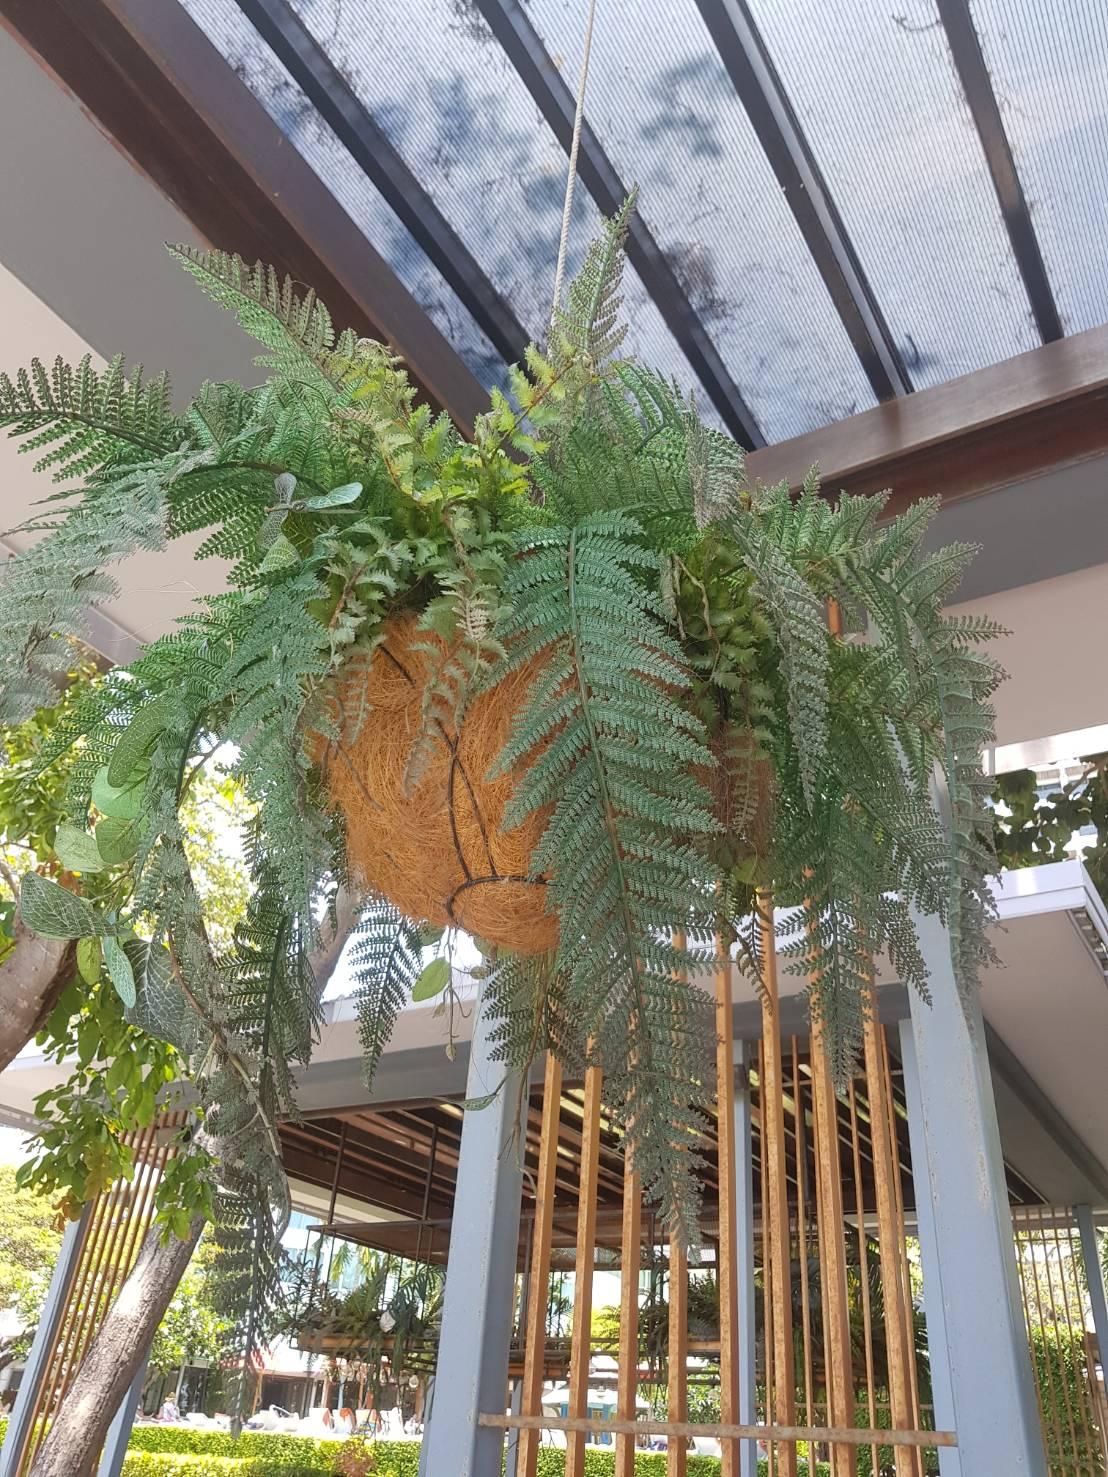 Biodegradable hanging baskets